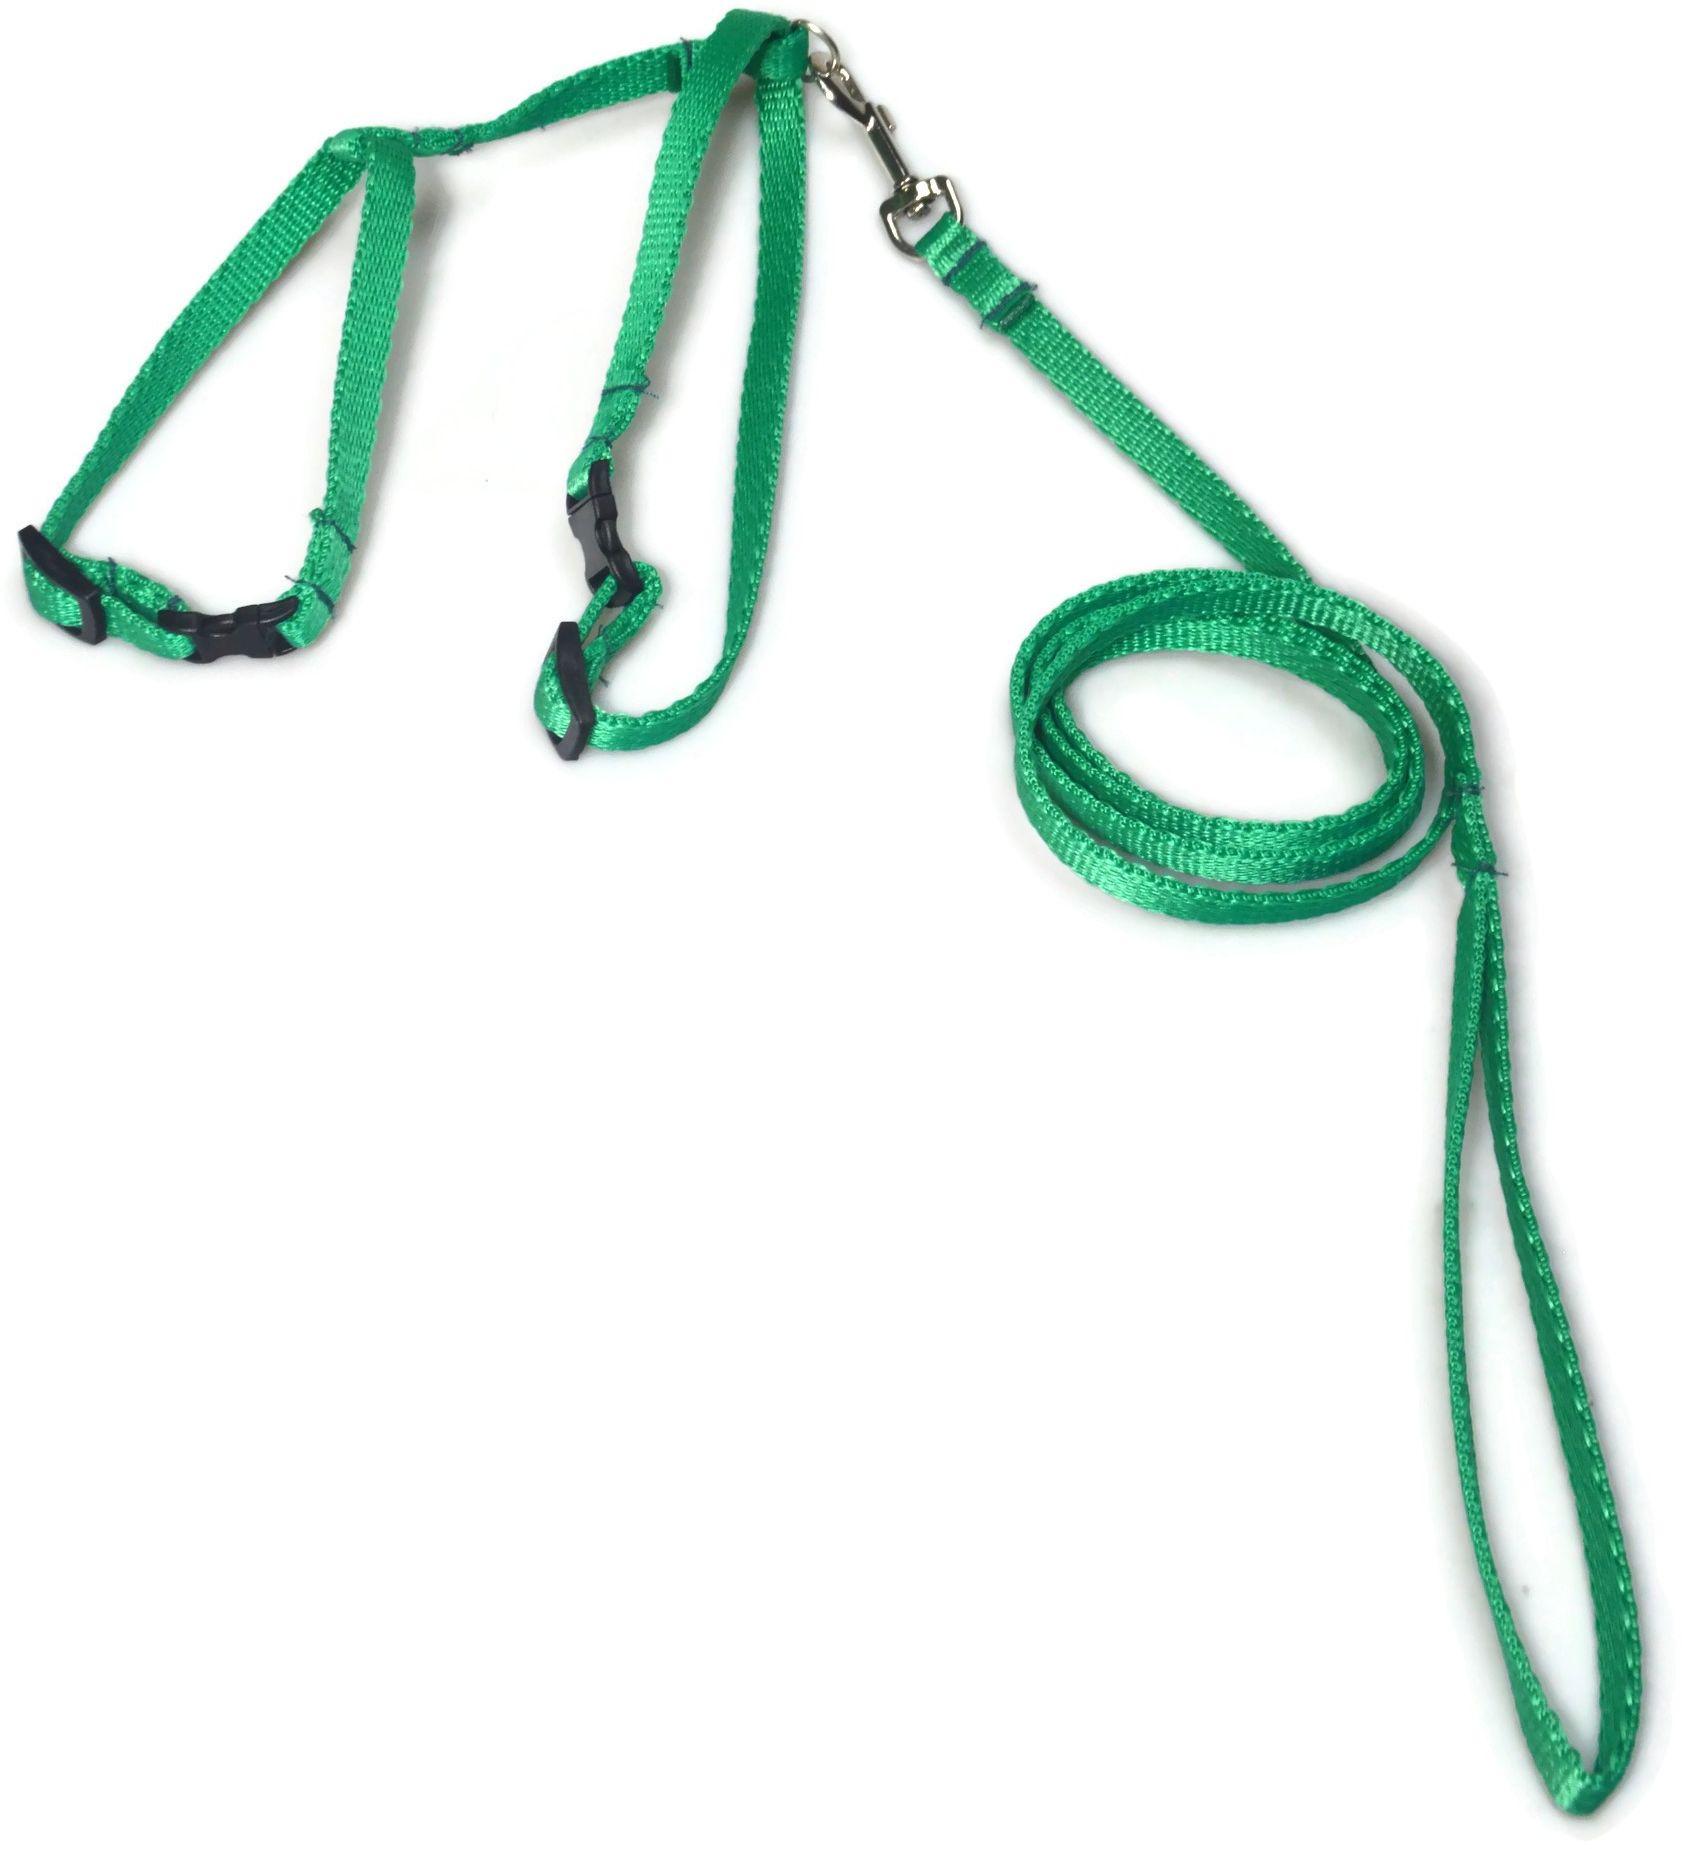 A-058 KOMPLET DLA KOTA V.1 : Kolor - Zielony - ALIZOO